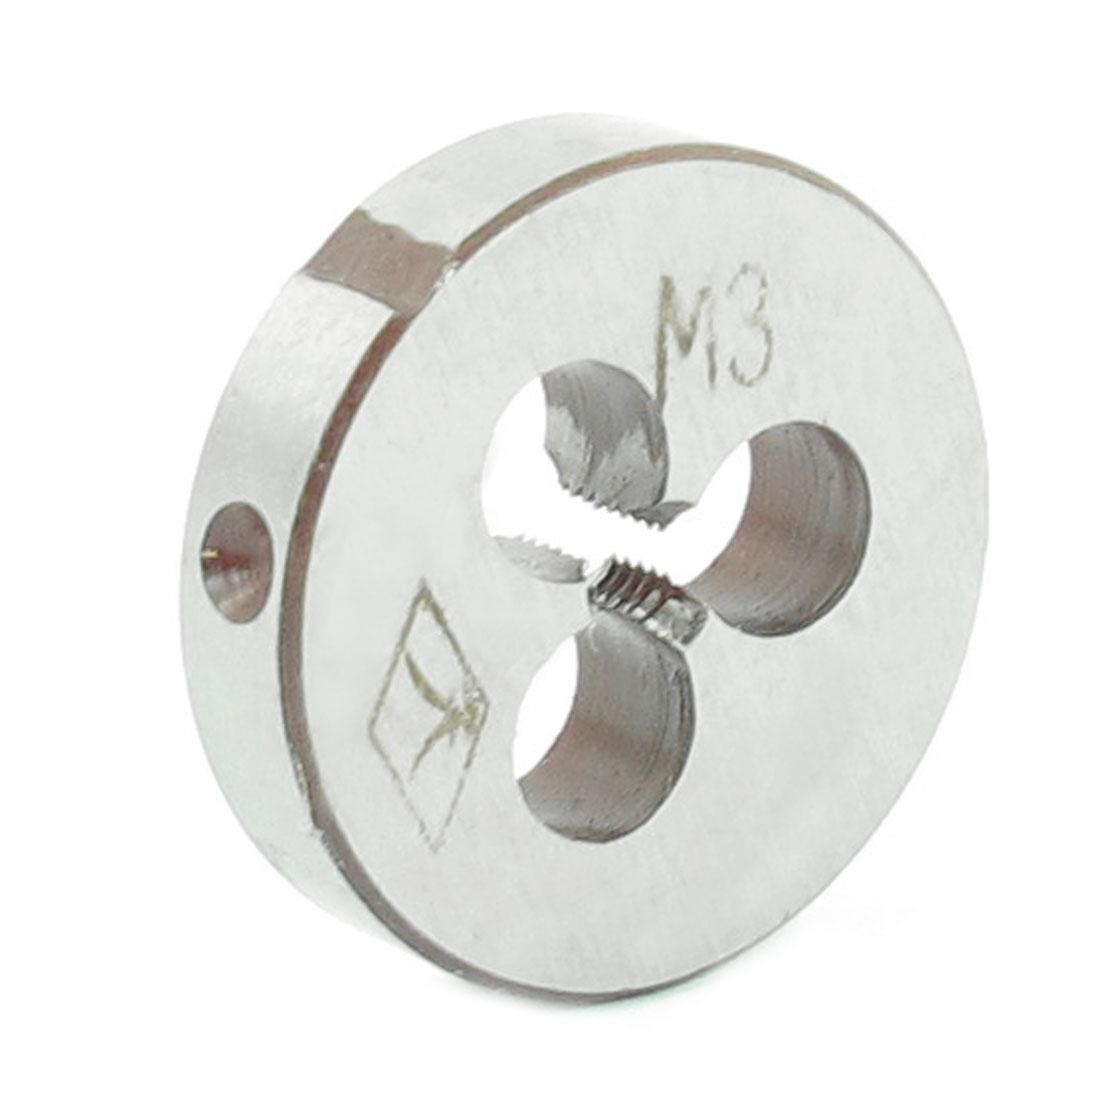 Steel 5mm Thickness Metric M3 Screw Thread Round Die Tool